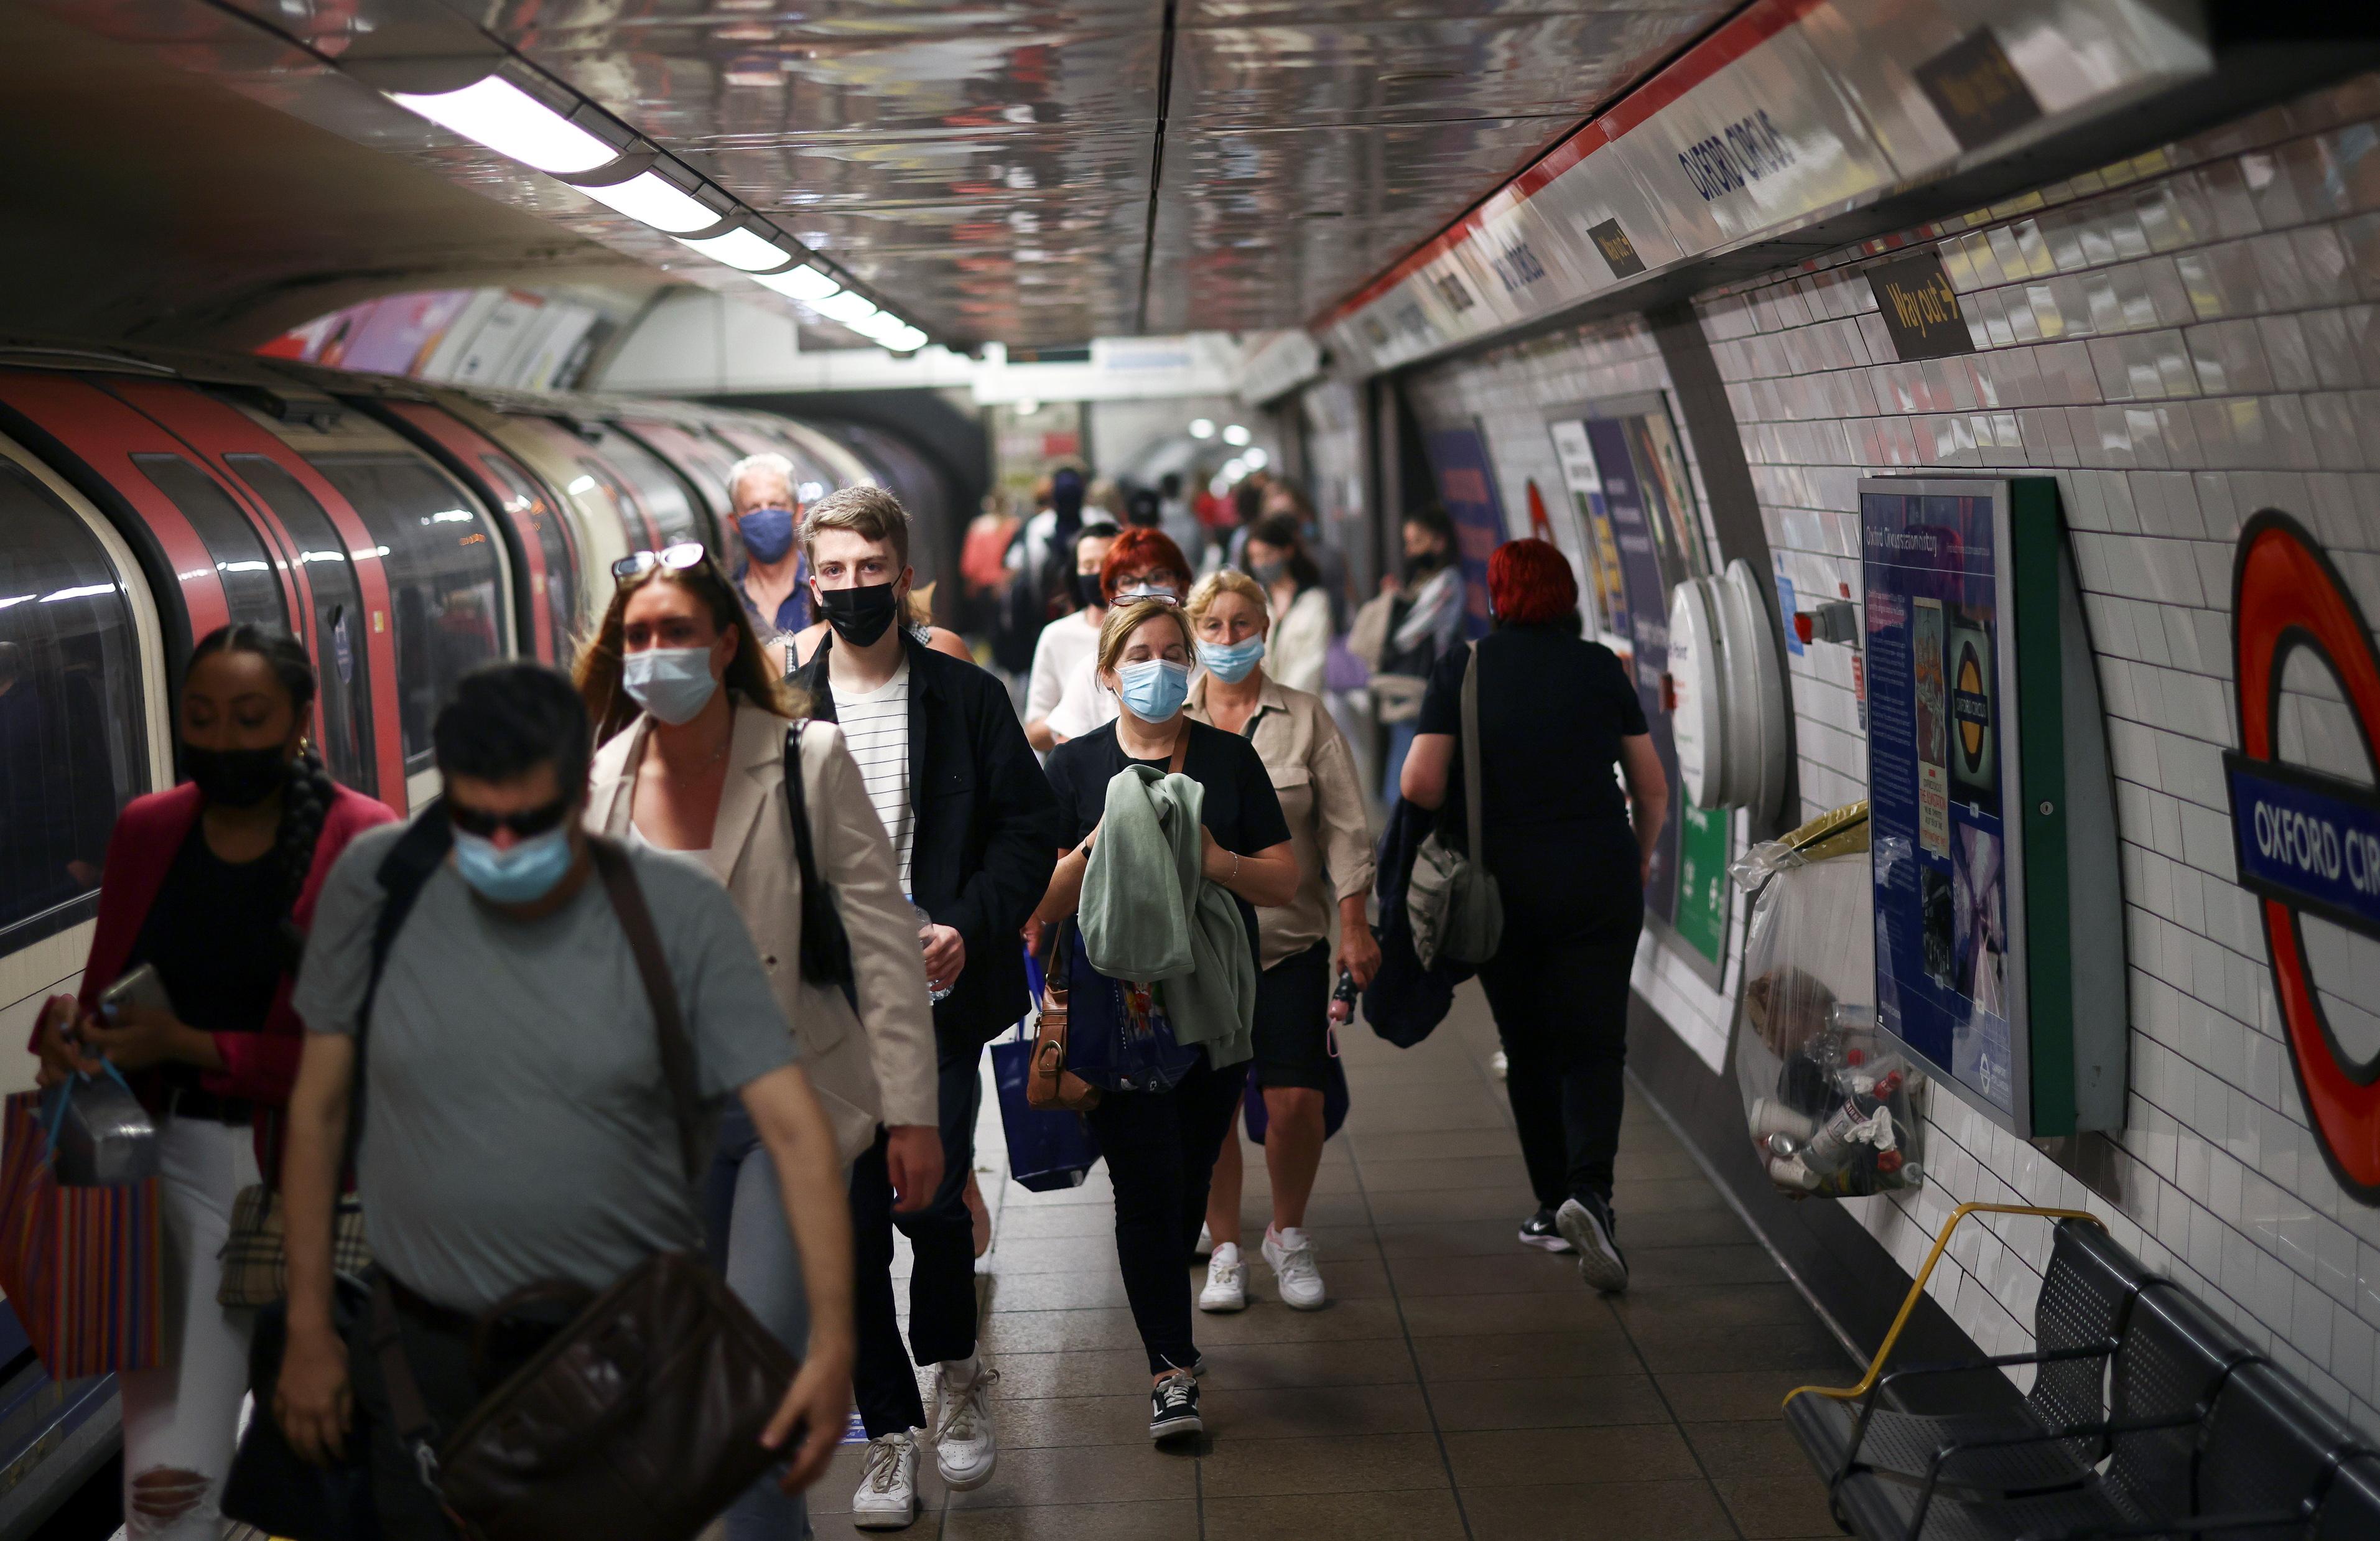 London commuters warned of transport misery if strike goes ahead